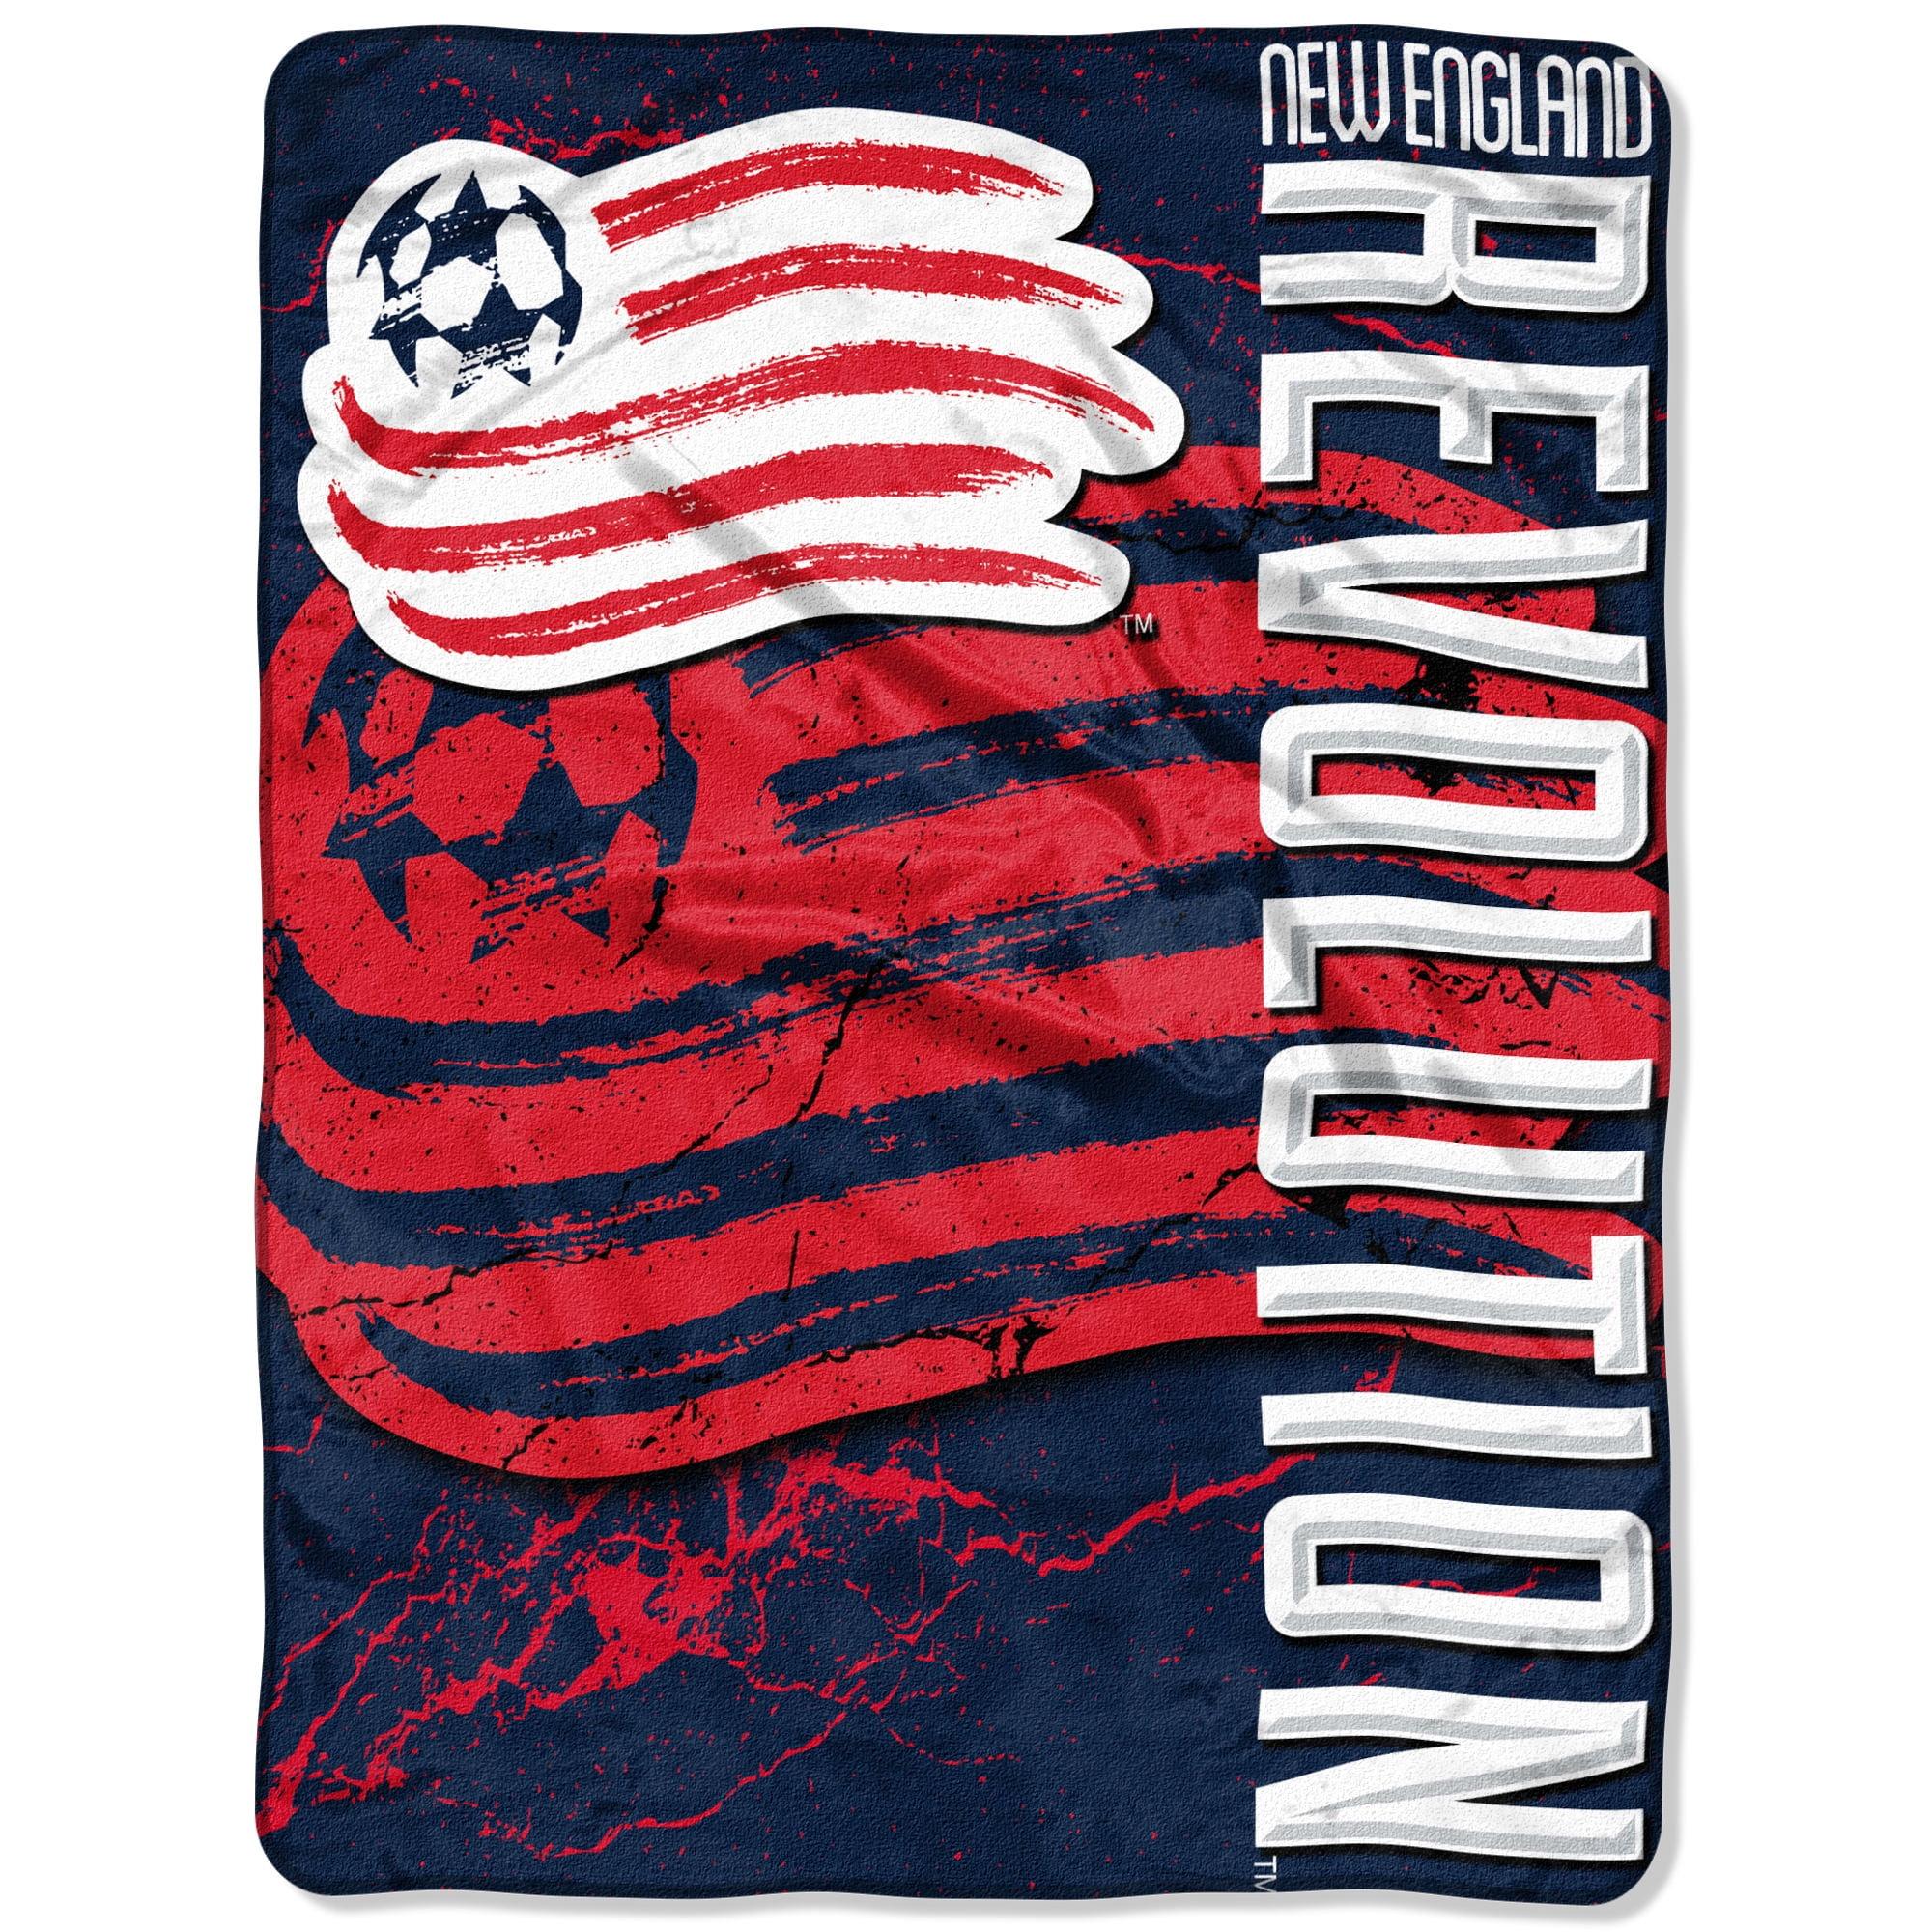 "New England Revolution The Northwest Company 46"" x 60"" Concrete Raschel Throw Blanket - Navy - No Size"